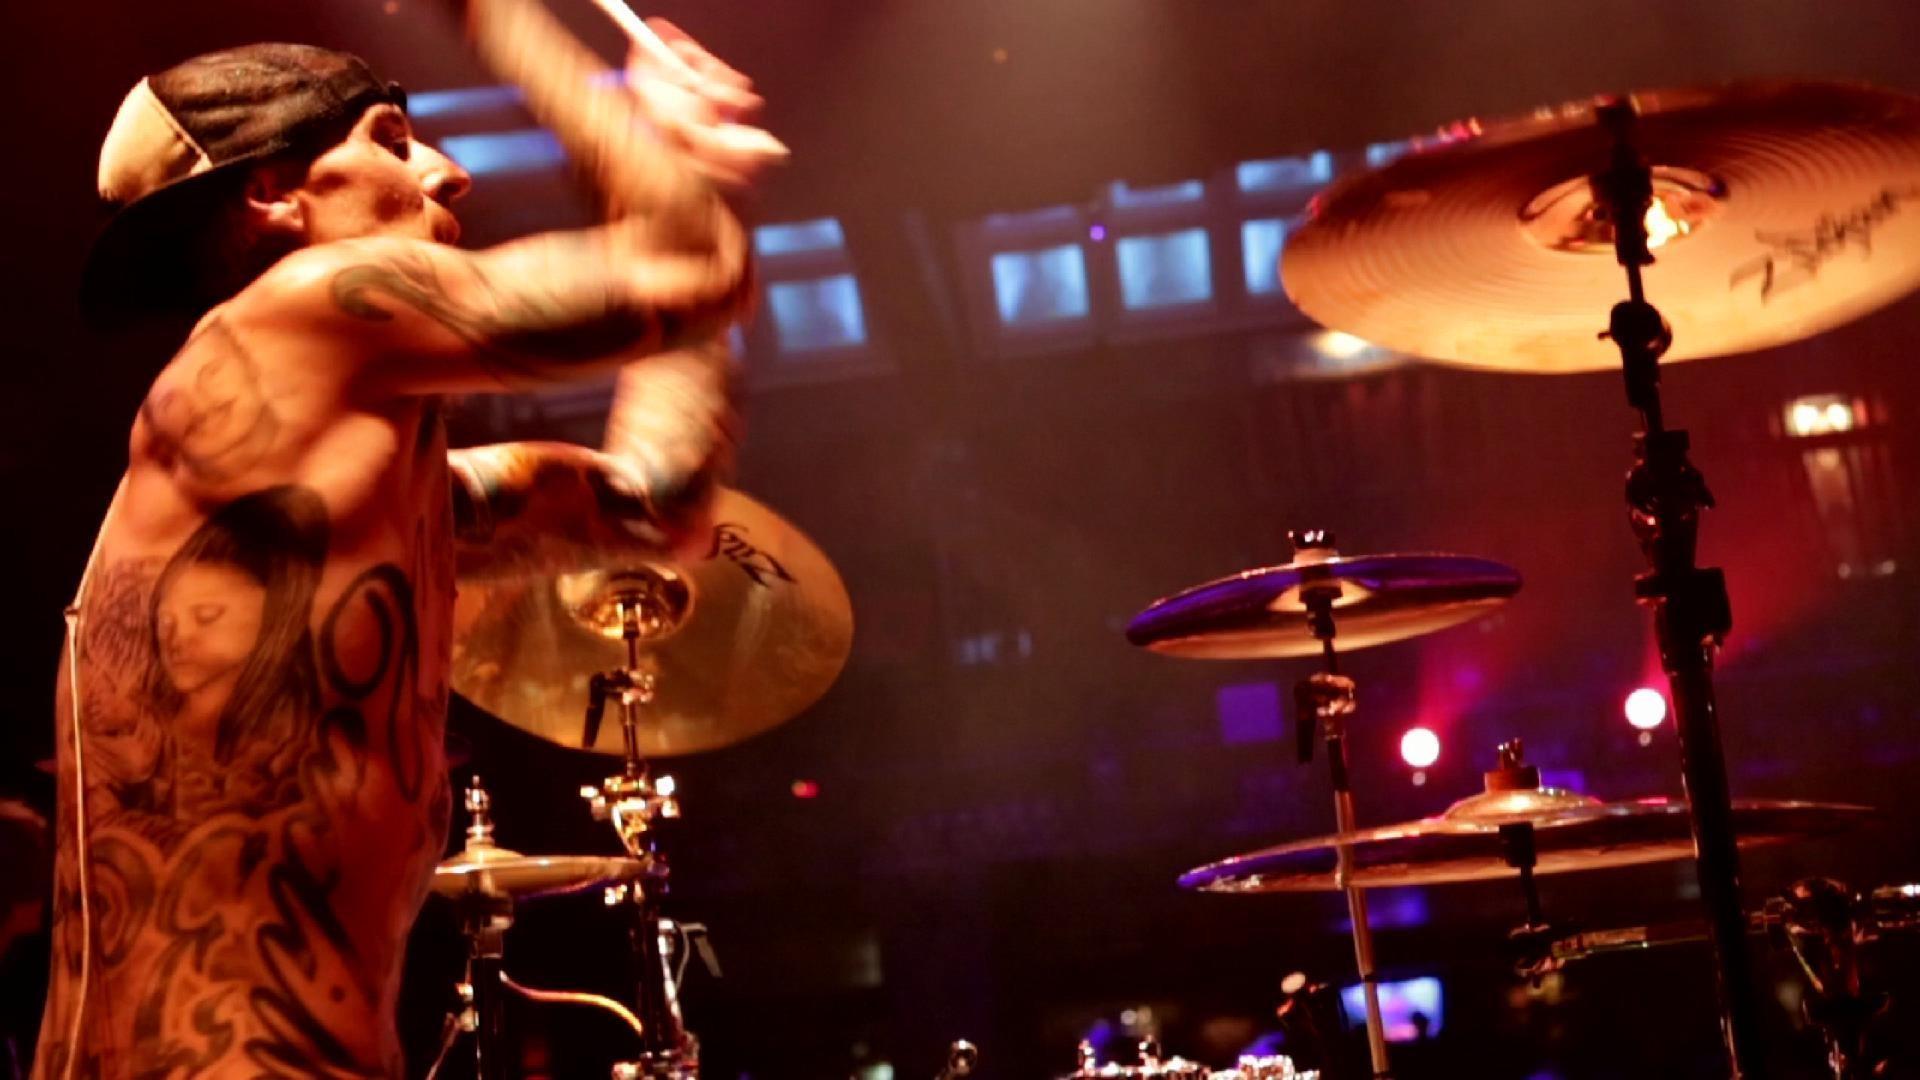 Push 'Em - Travis Barker & Yelawolf - Vevo